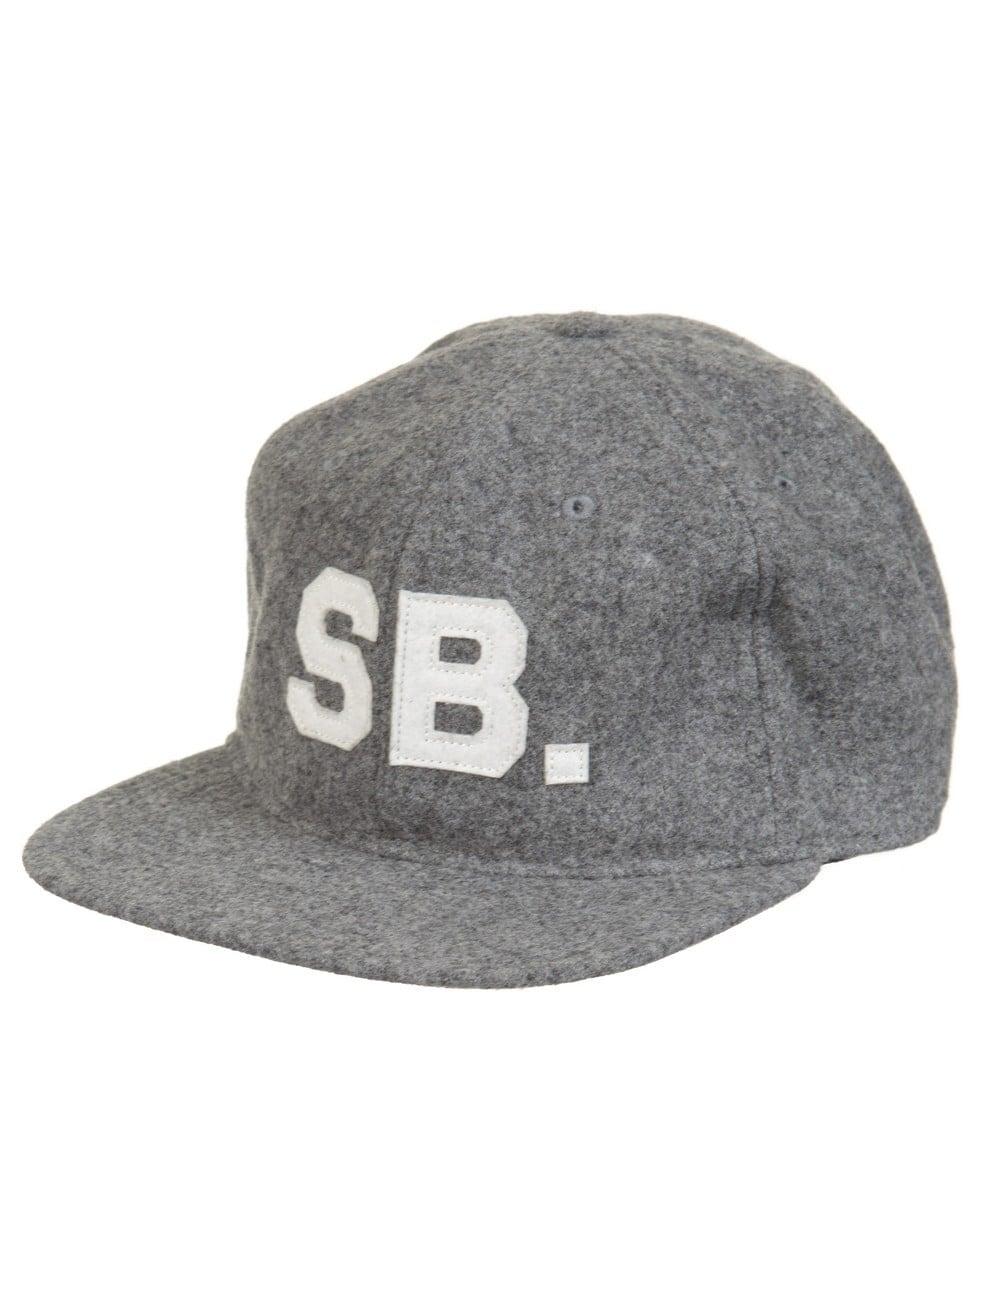 2b597cb05f Nike SB Infield Pro Snapback Hat - Grey - Hat Shop from Fat Buddha ...